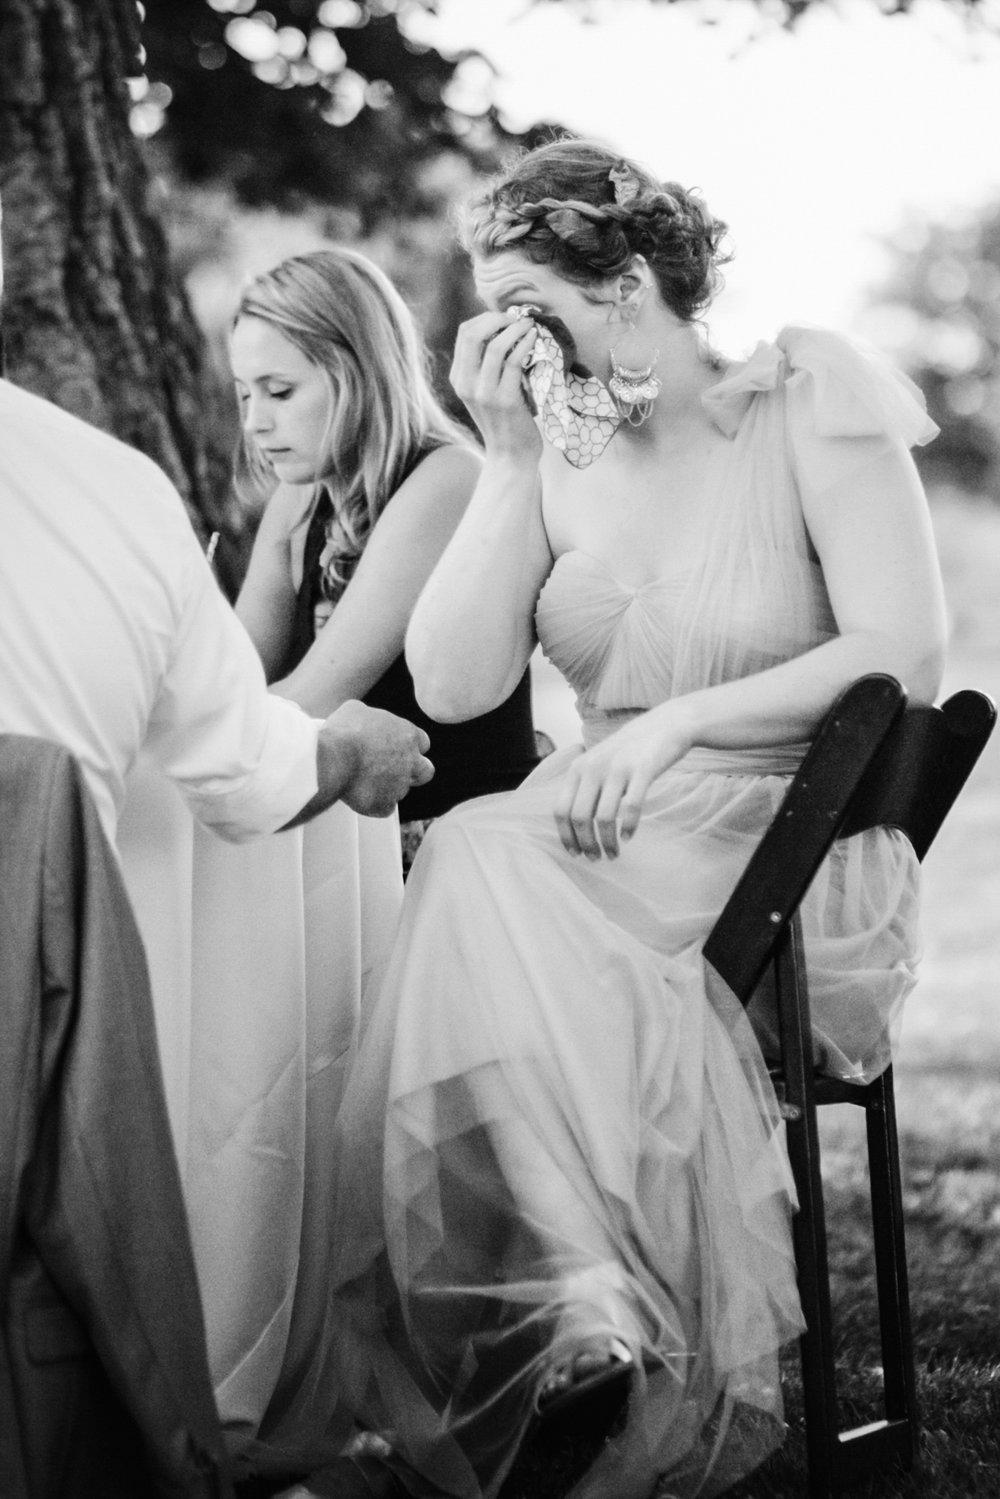 Kimberly-Coccagnia-Wedding-Photographer-234.JPG